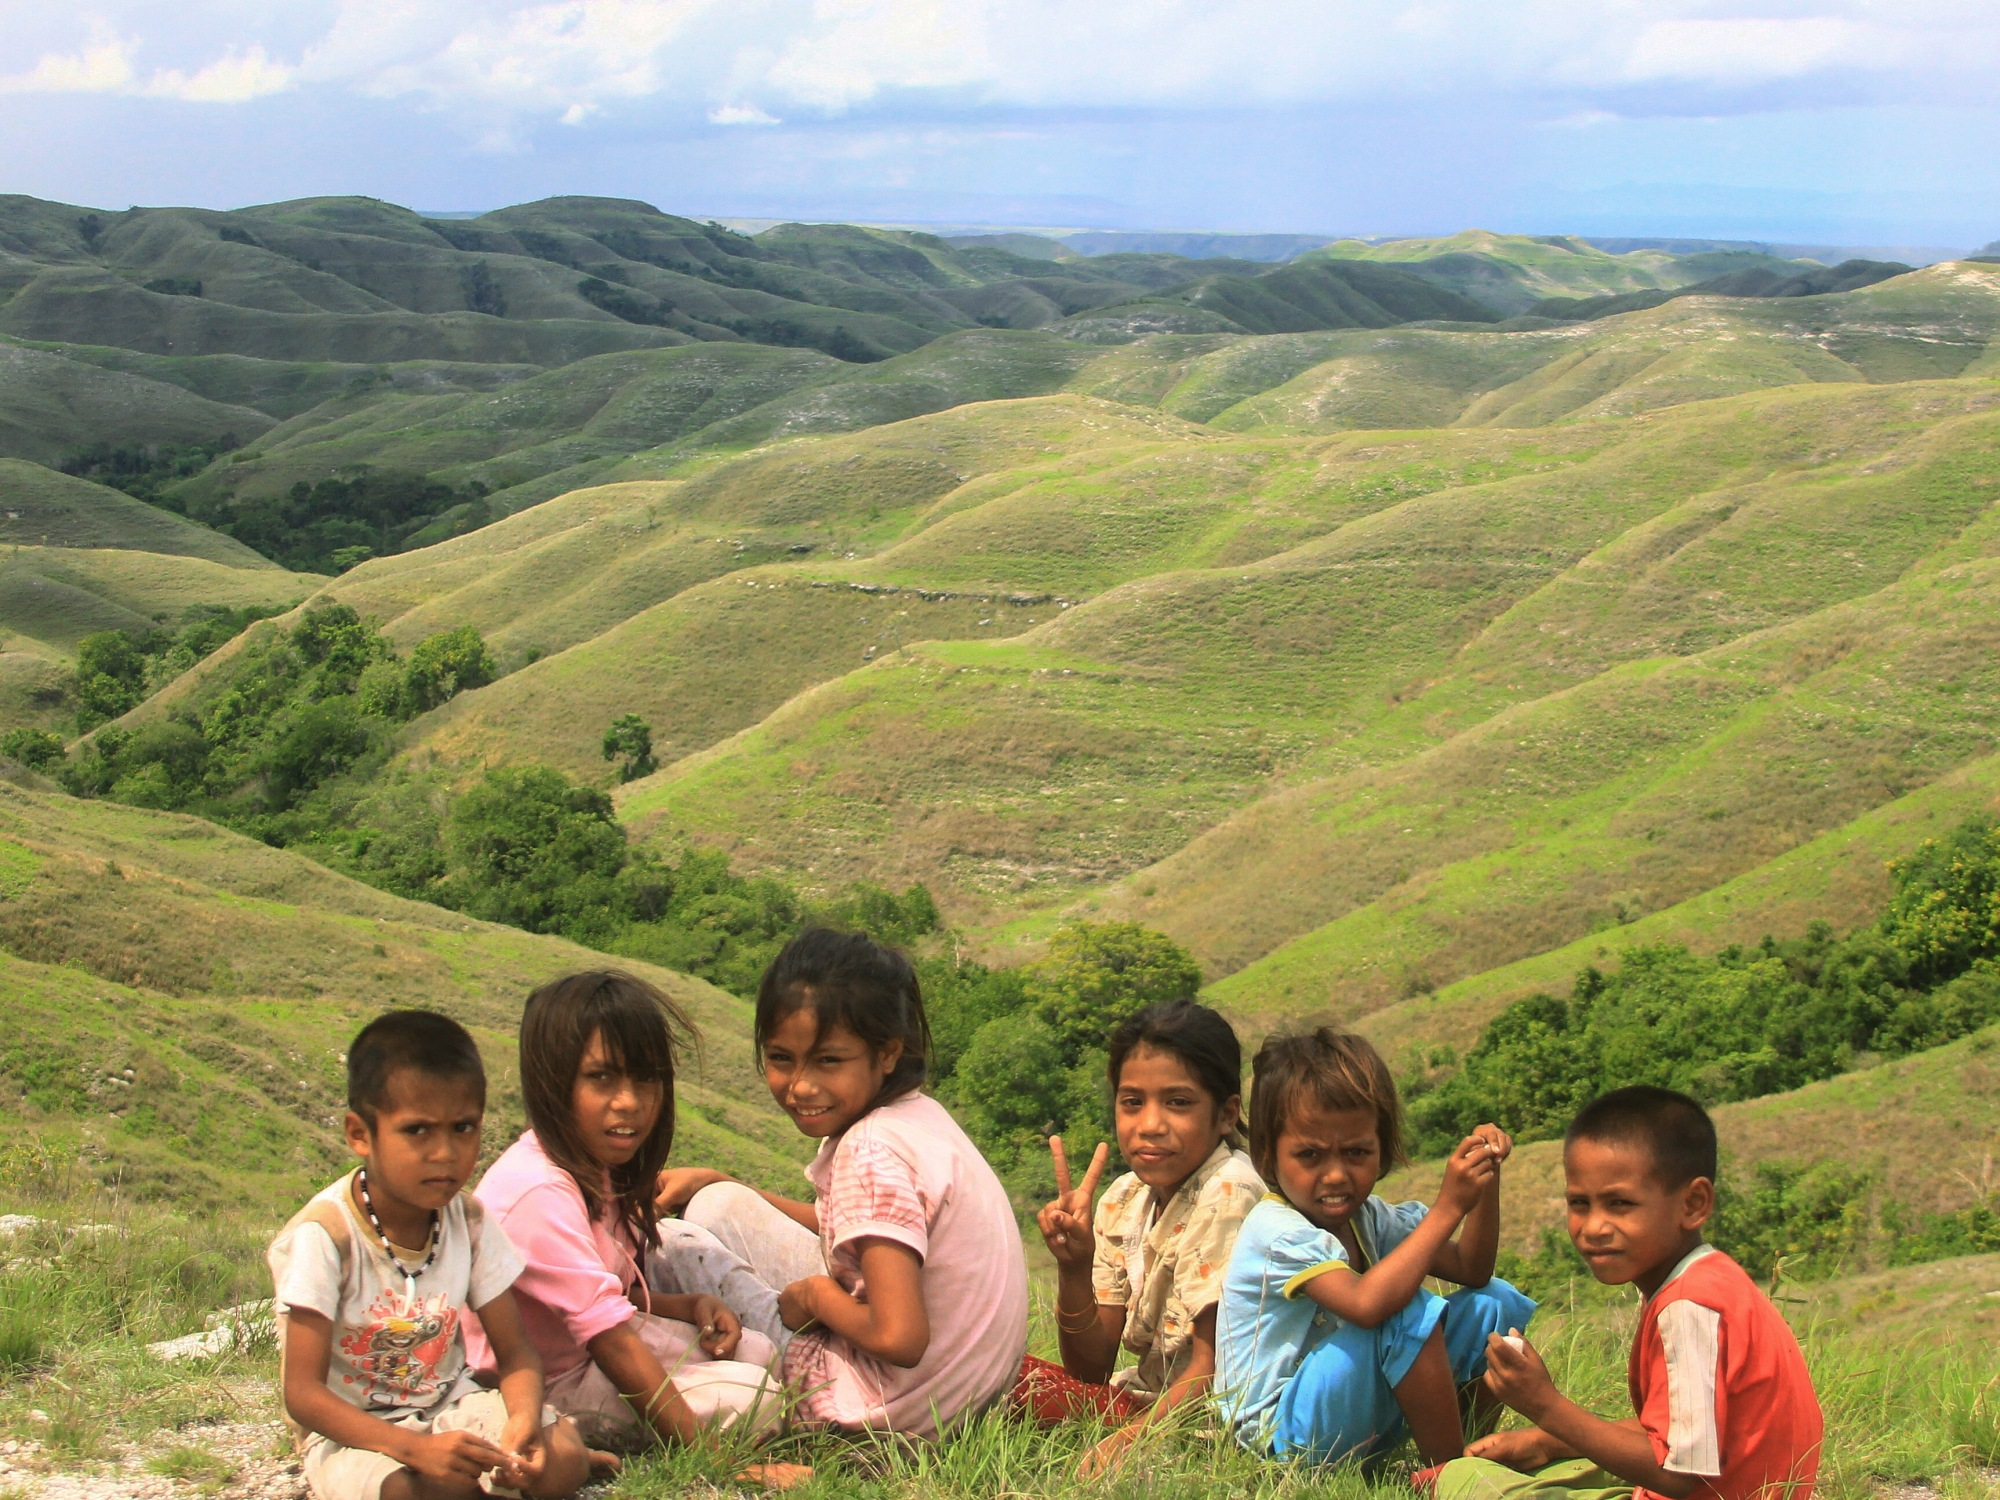 Anak-anak Sumba, Masa depan nasib Sumba